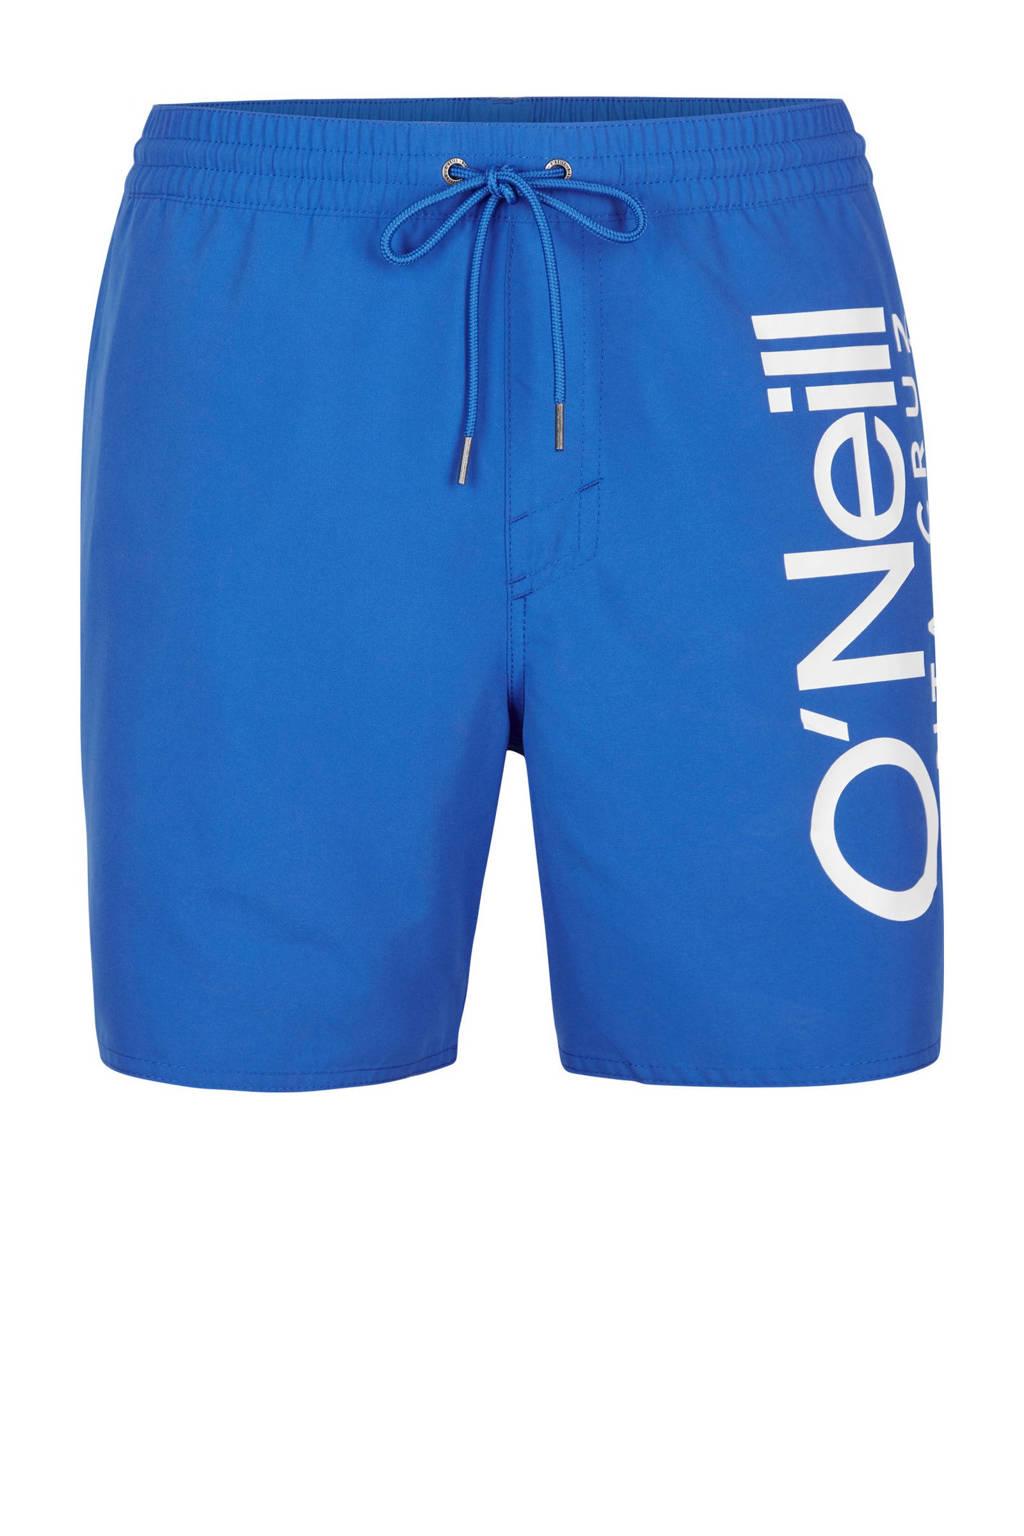 O'Neill zwemshort Cali blauw, Blauw